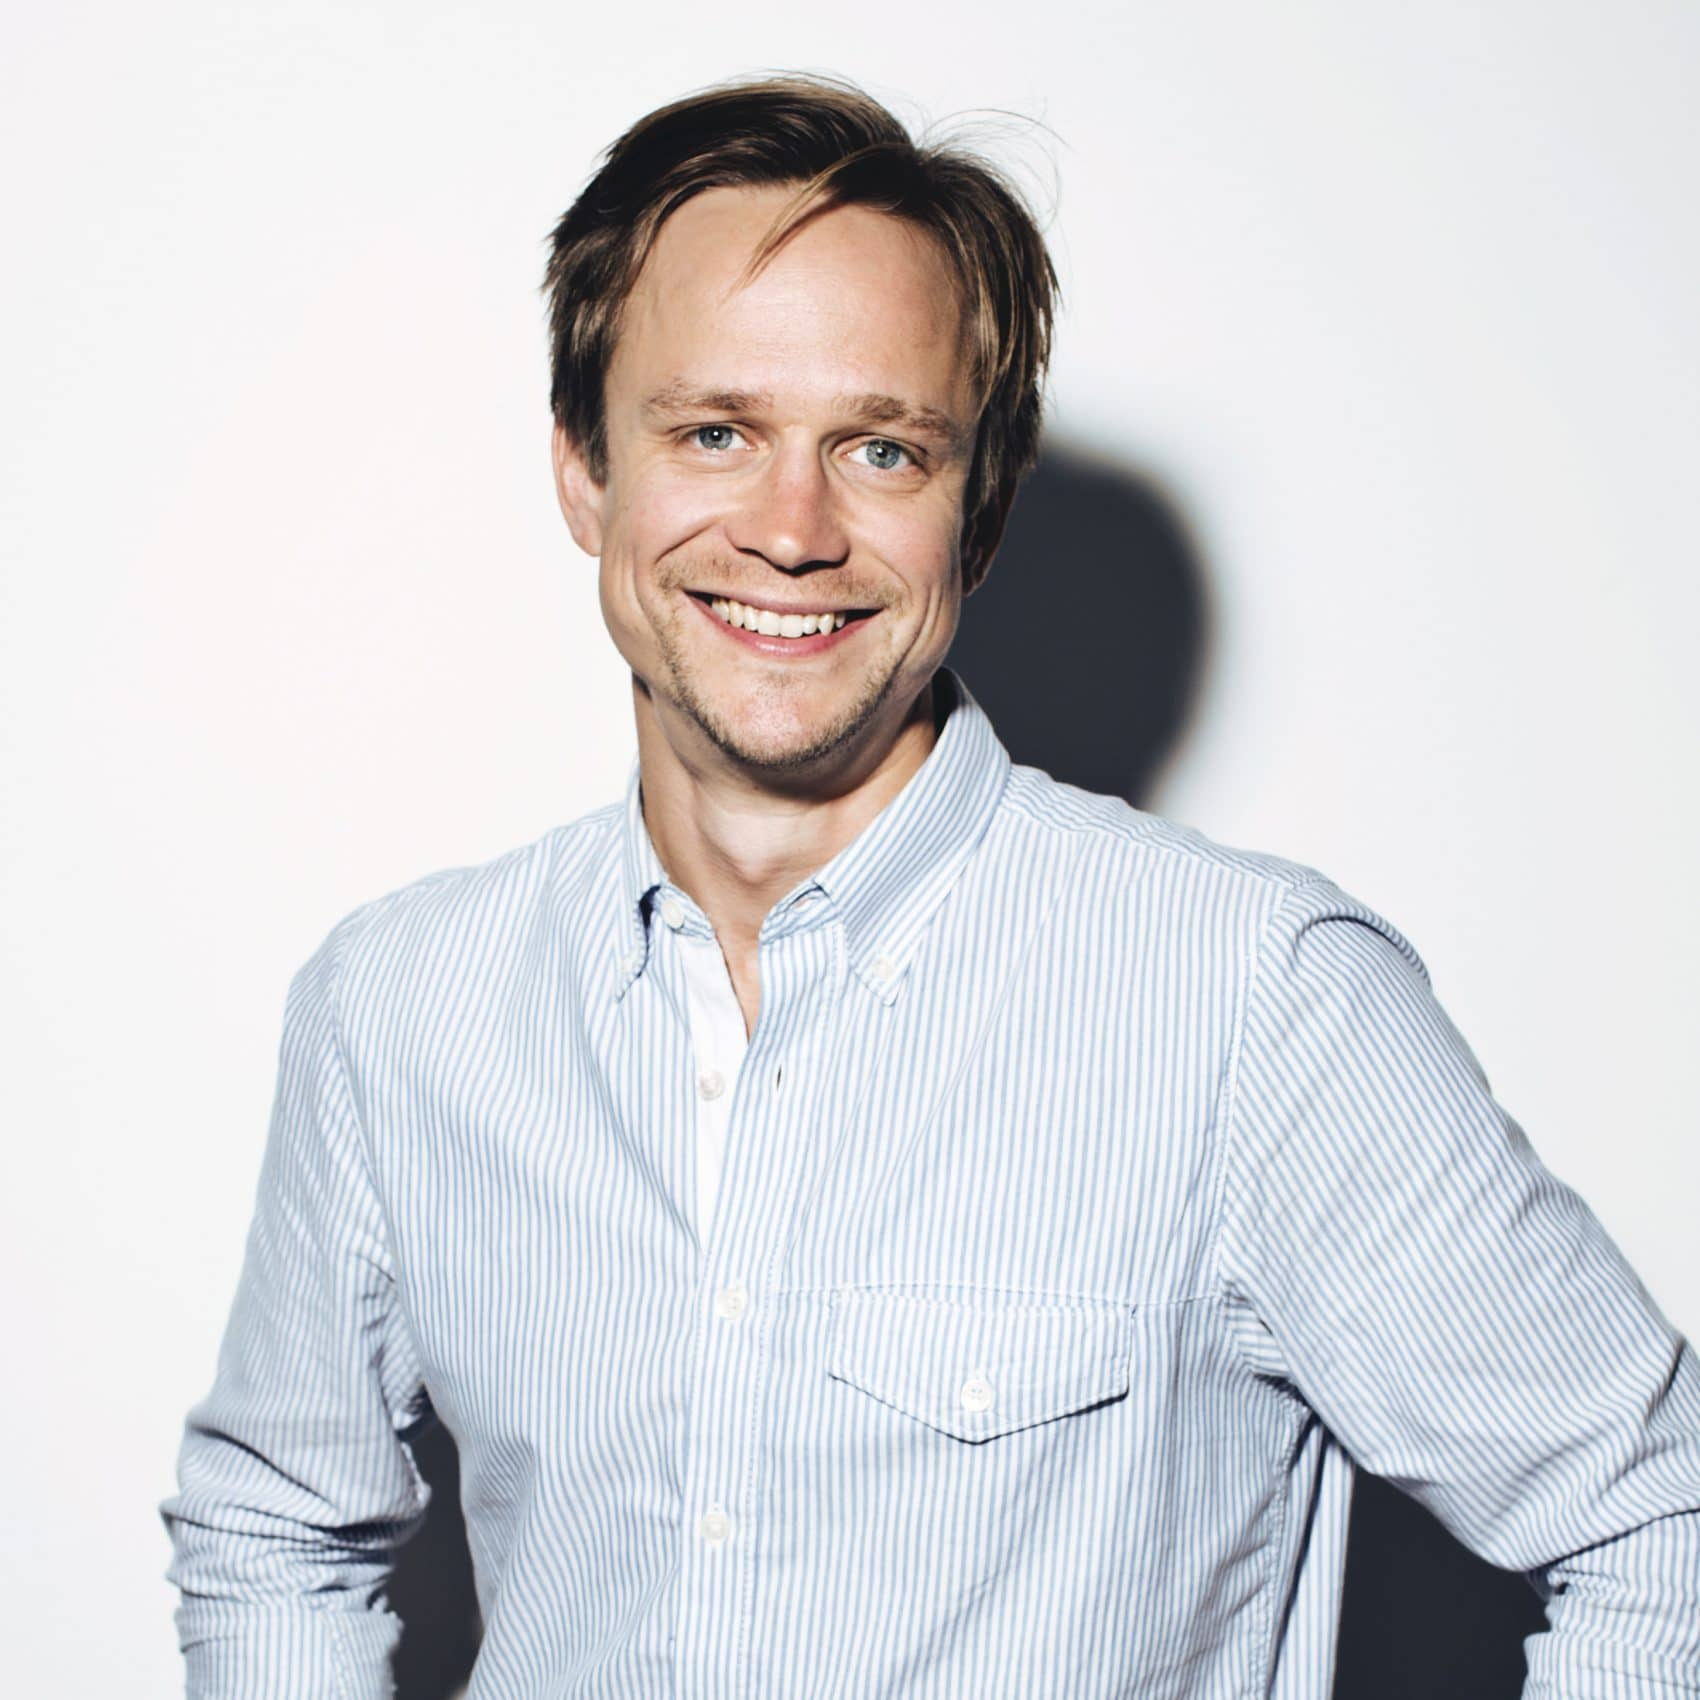 Johan Andersson, Managing Director